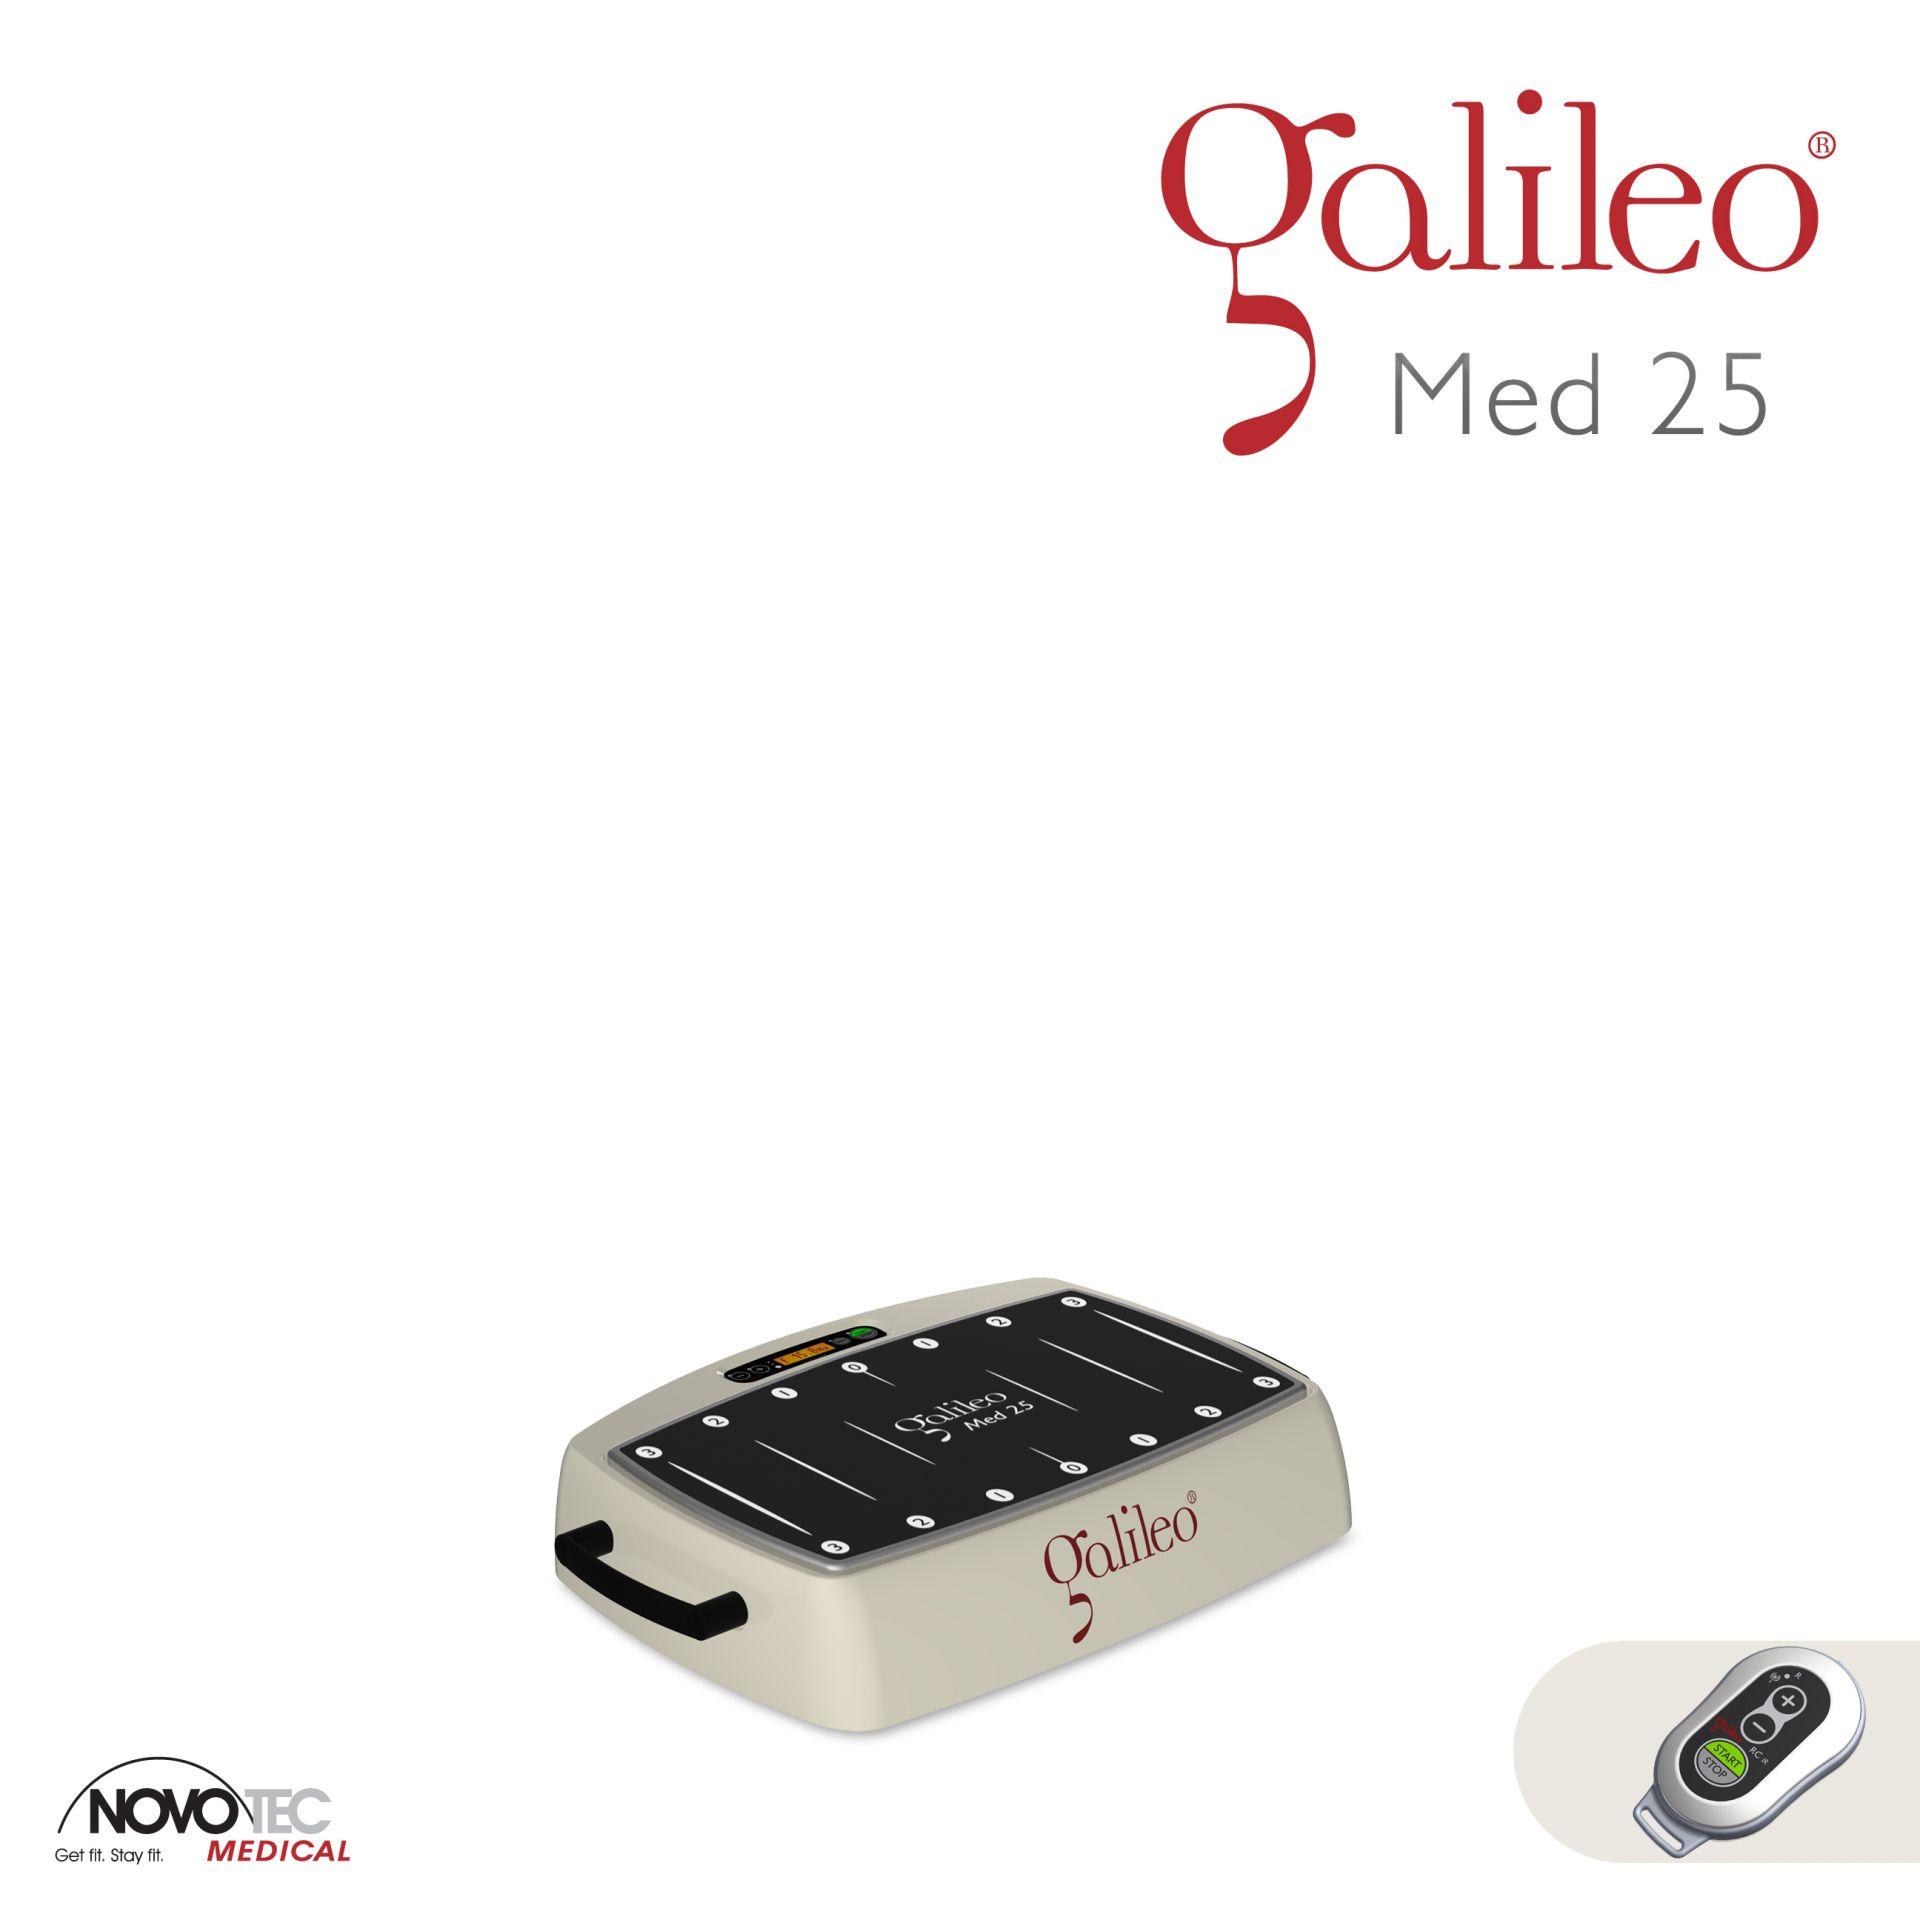 Вибротренажер GALILEO MED BASIC